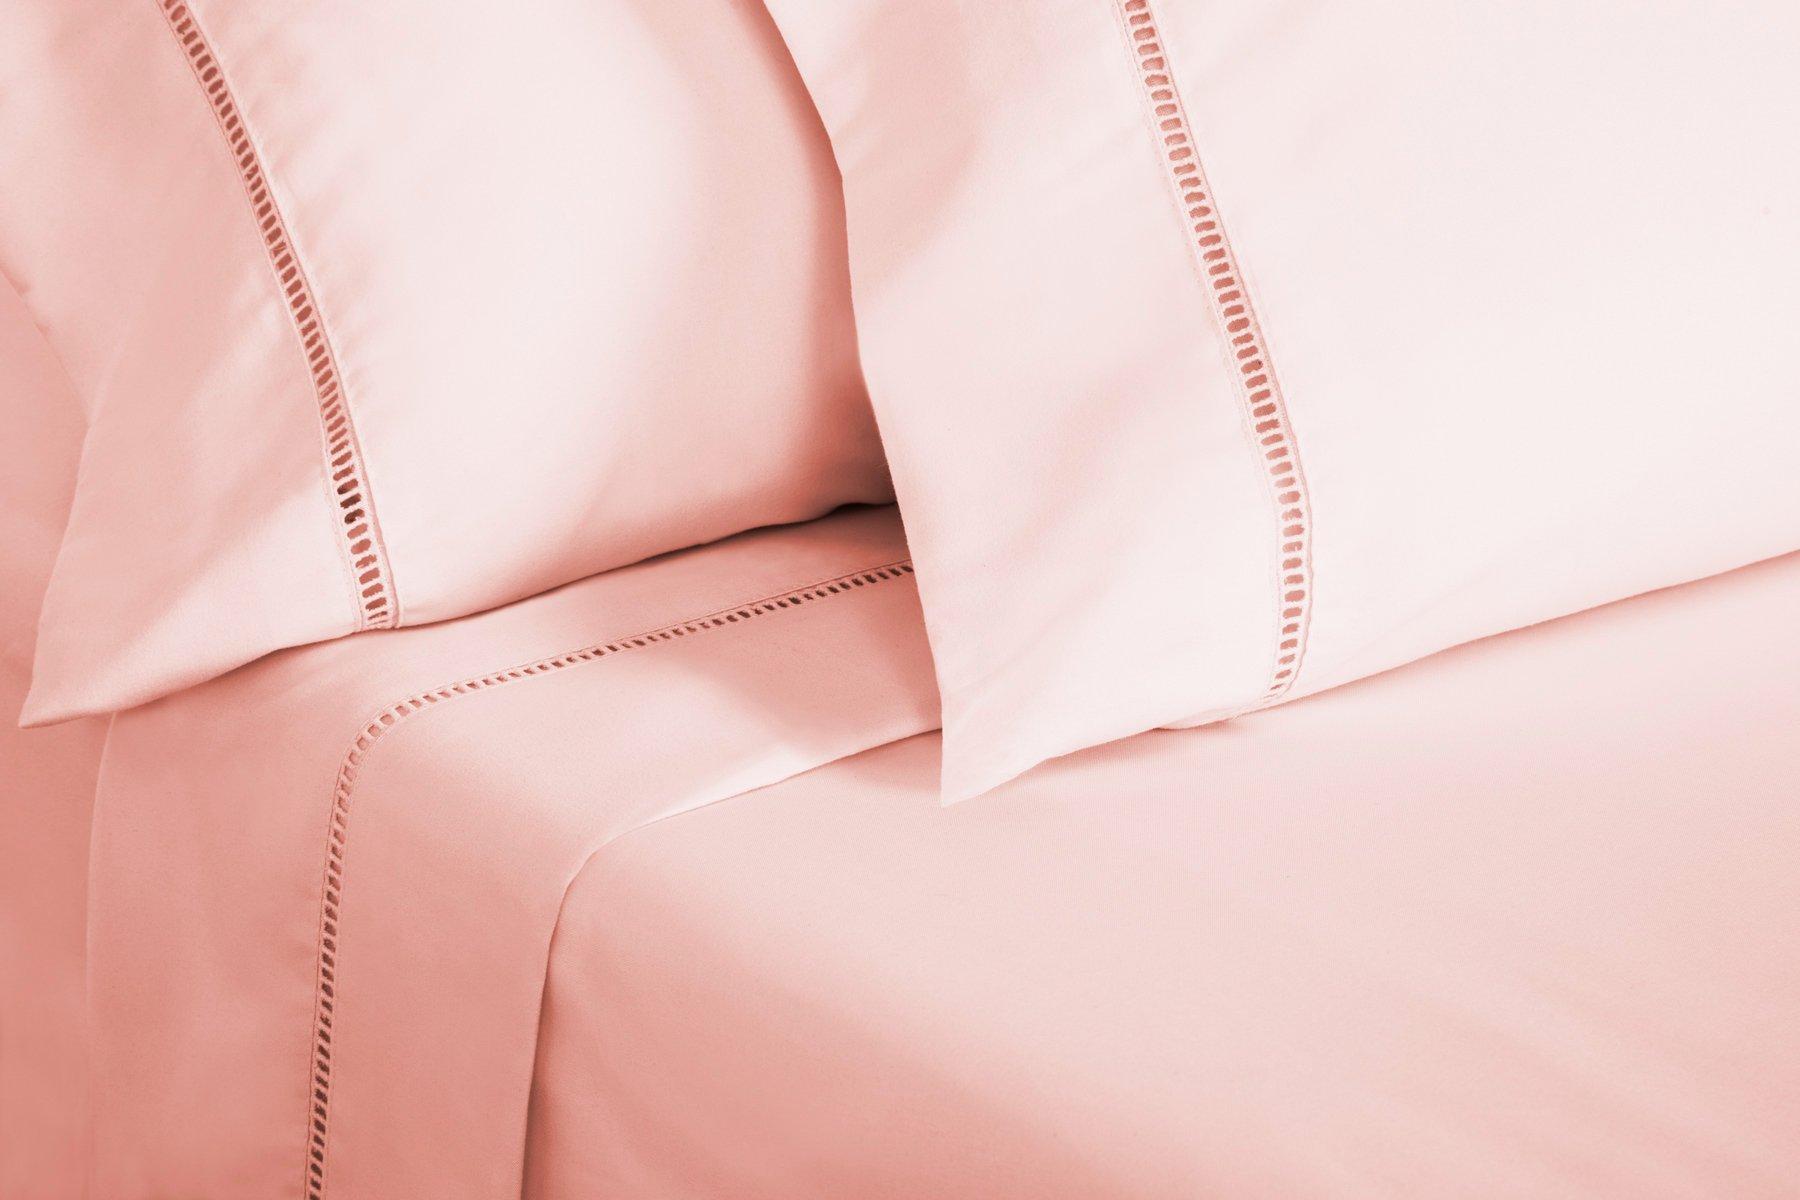 Grace Premium Microfiber Sheet Set - Super Soft, Deep Pocket, Embellished with Hypoallergenic, Wrinkle Resistant and Fade Resistant Brushed Microfiber – 4 Piece Set (Full, Pink) by ViscoSoft (Image #2)